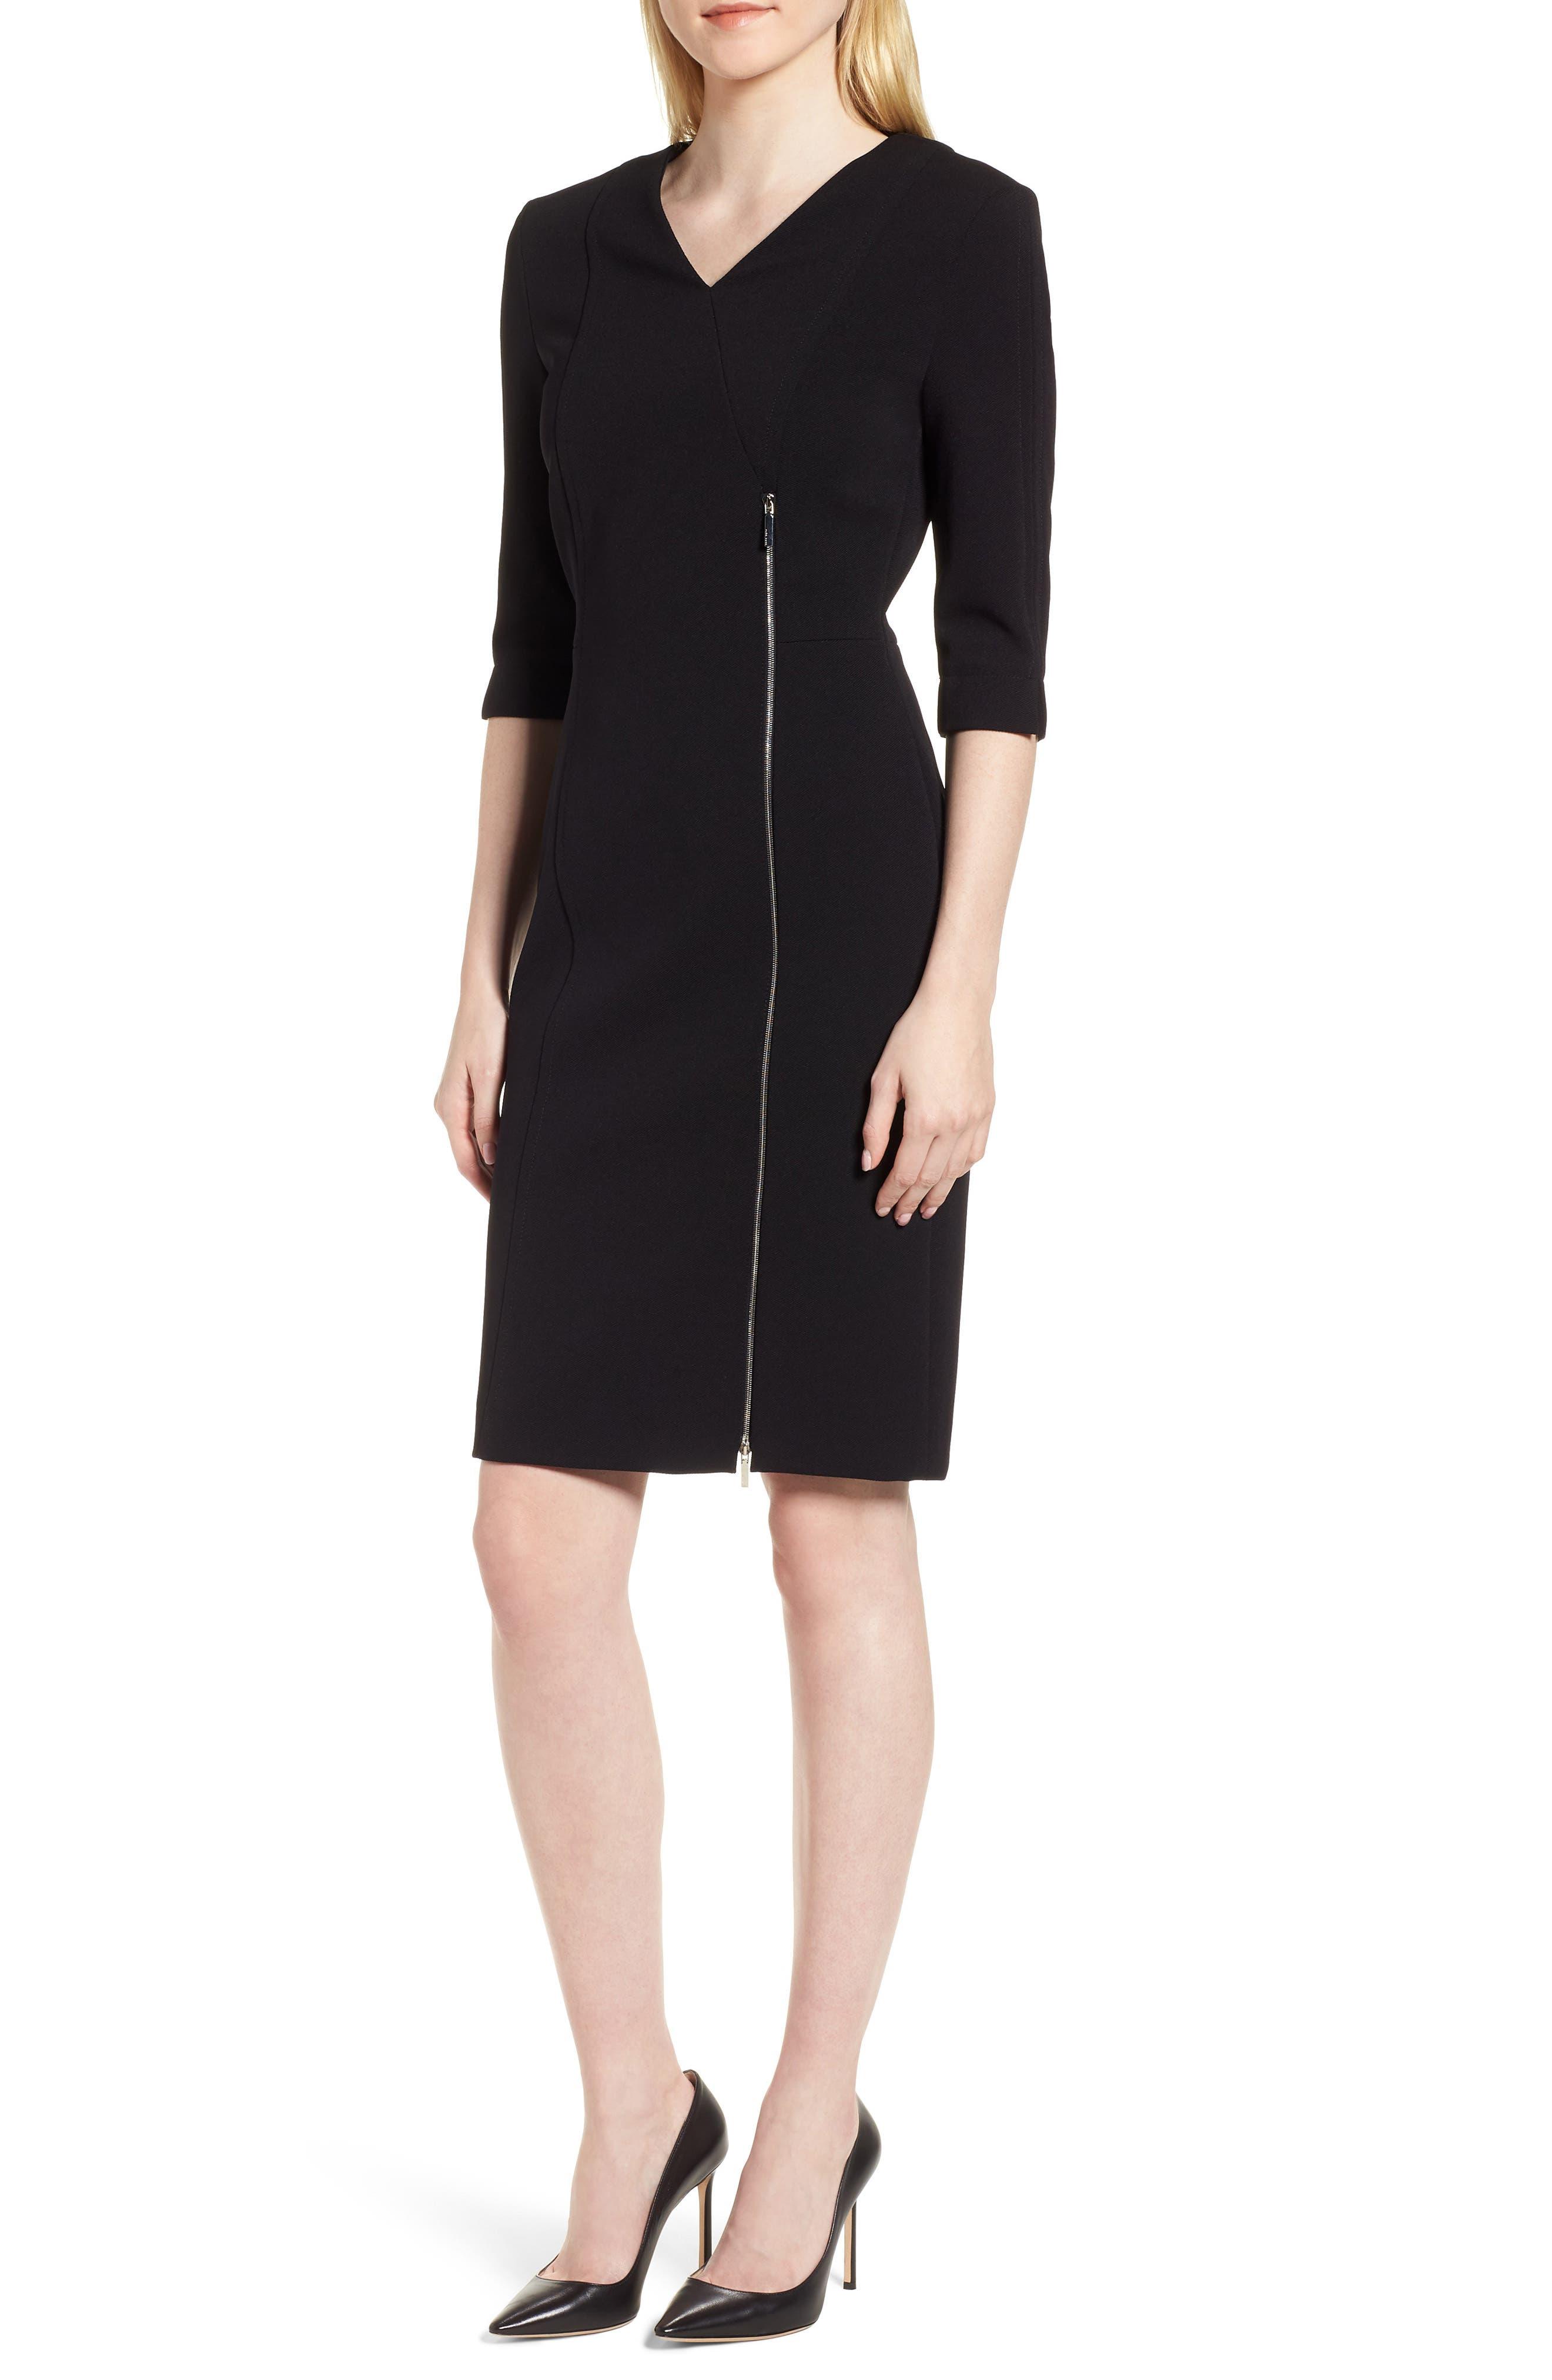 Deazema Twill Jersey Dress,                             Main thumbnail 1, color,                             001